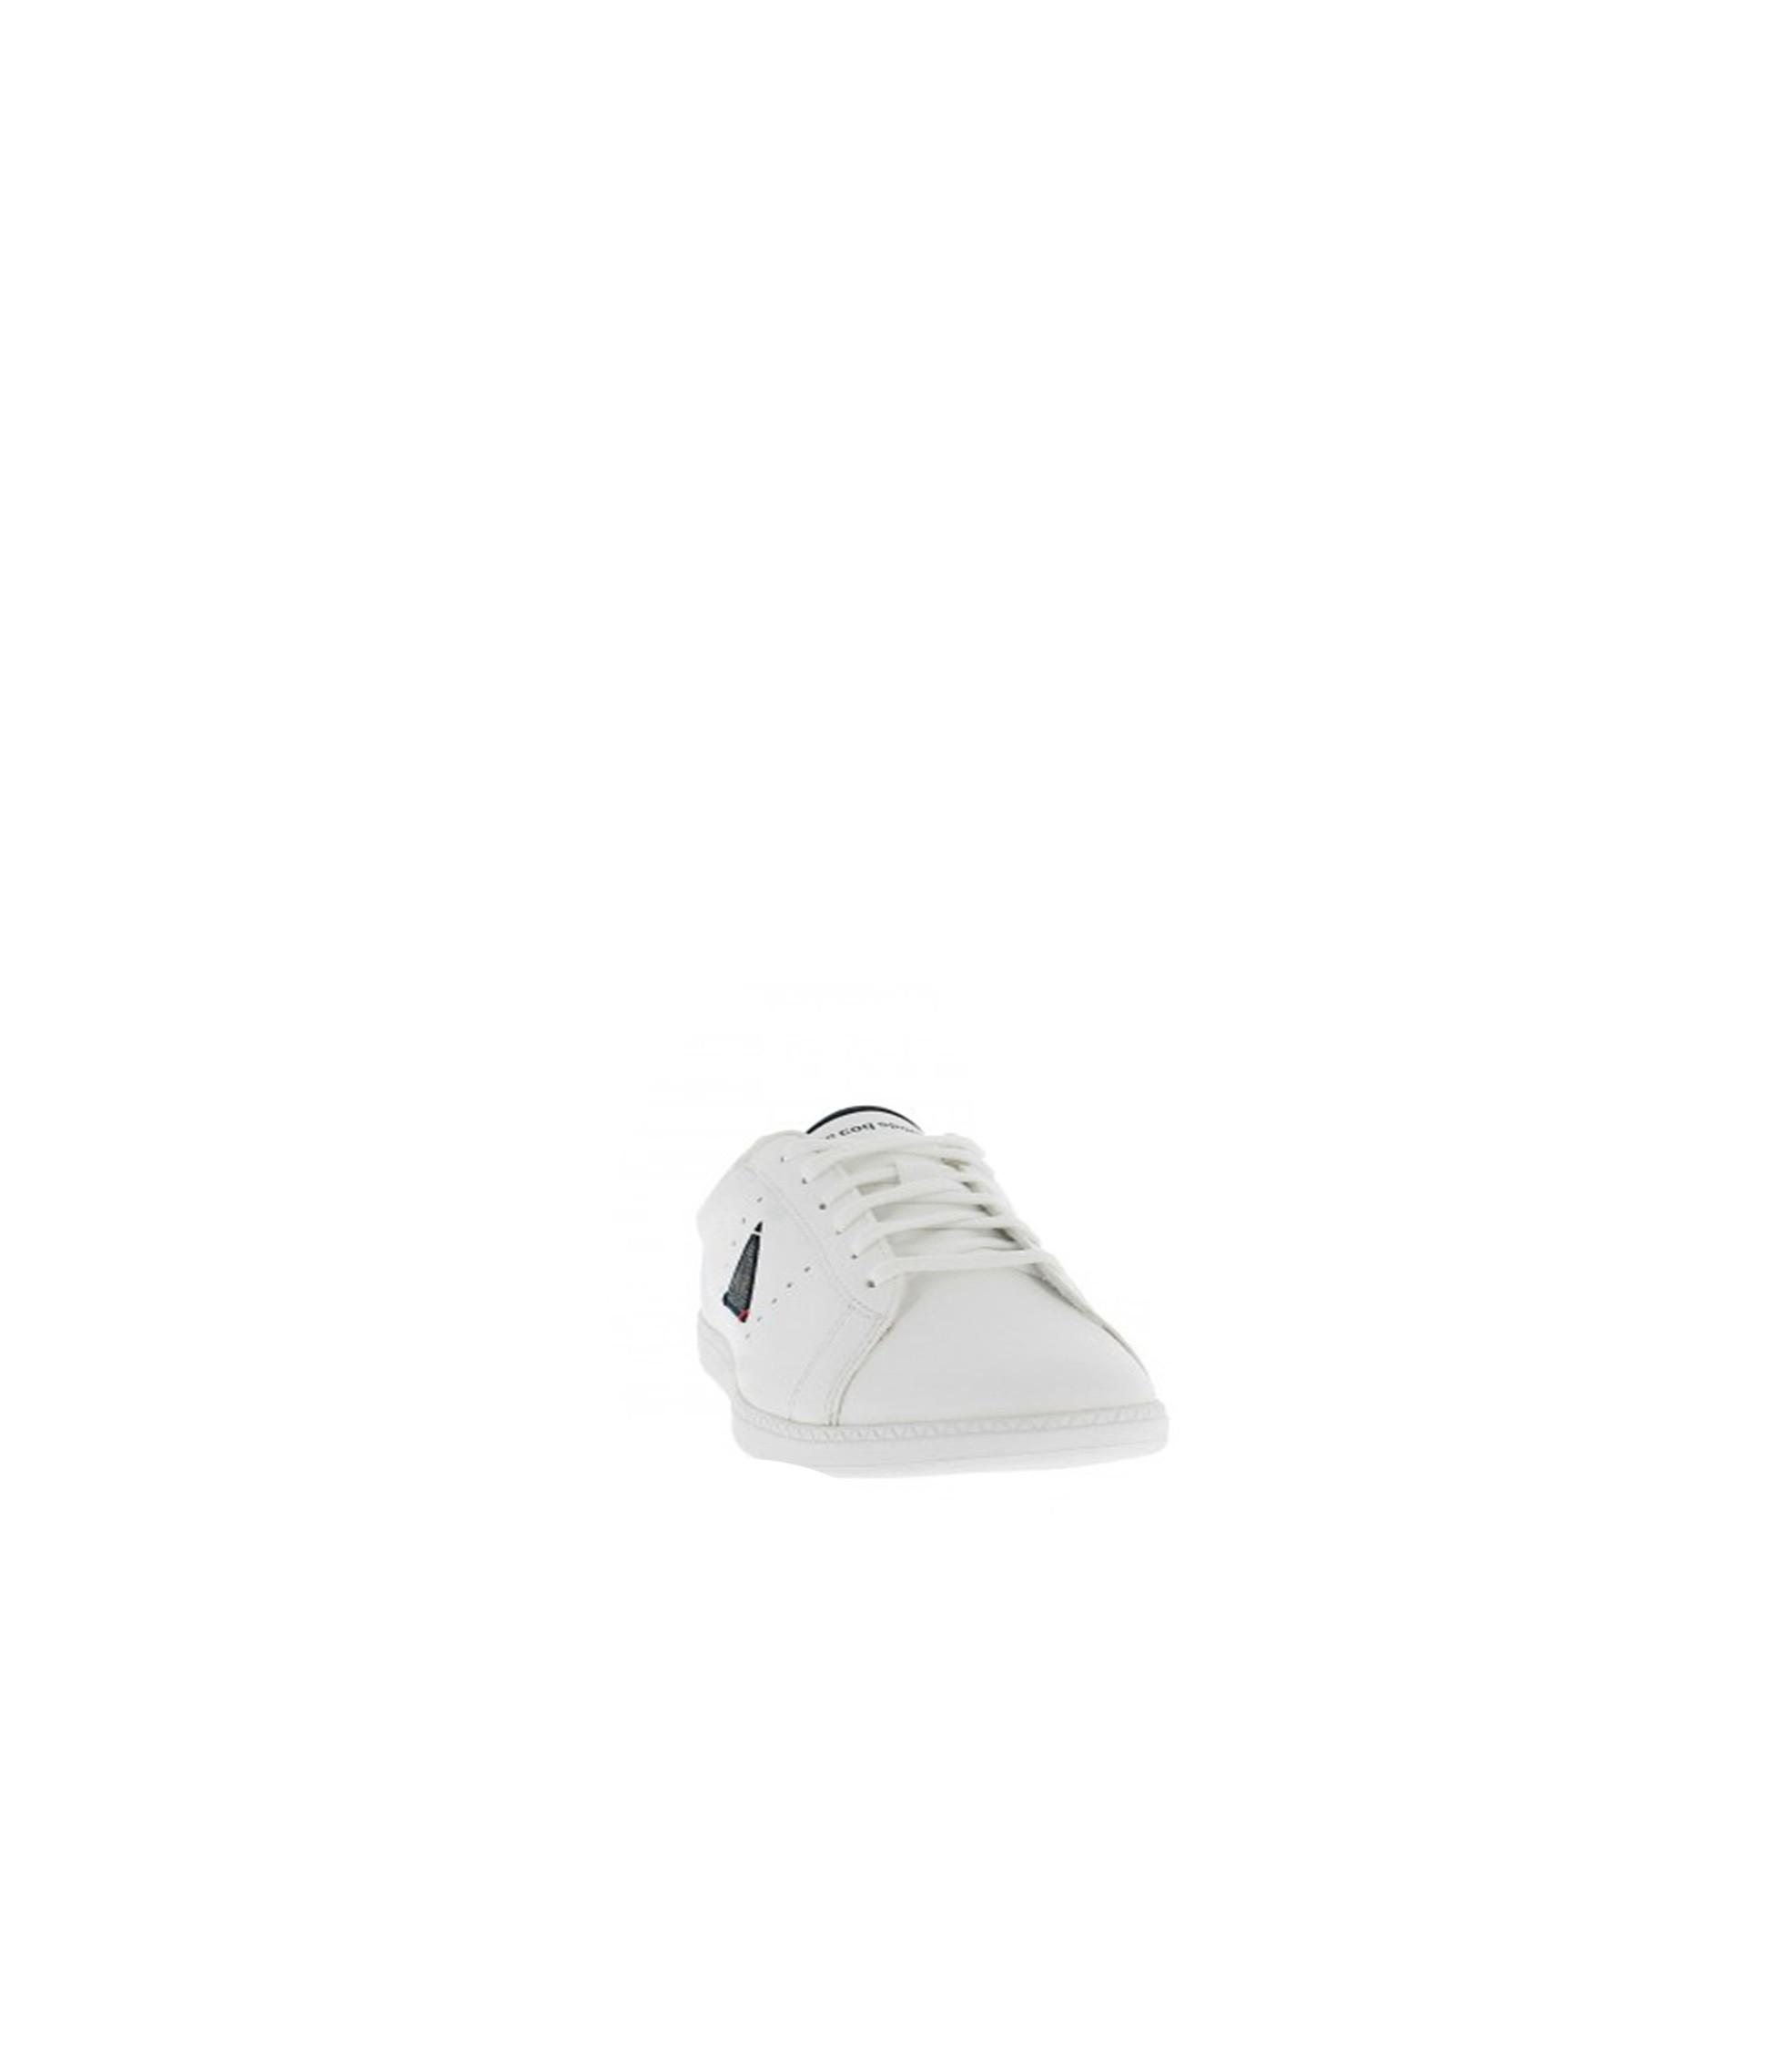 G S 180116 Lea Ball Coutone 1720112 Zapatillas zapatillas Las qp6gtf